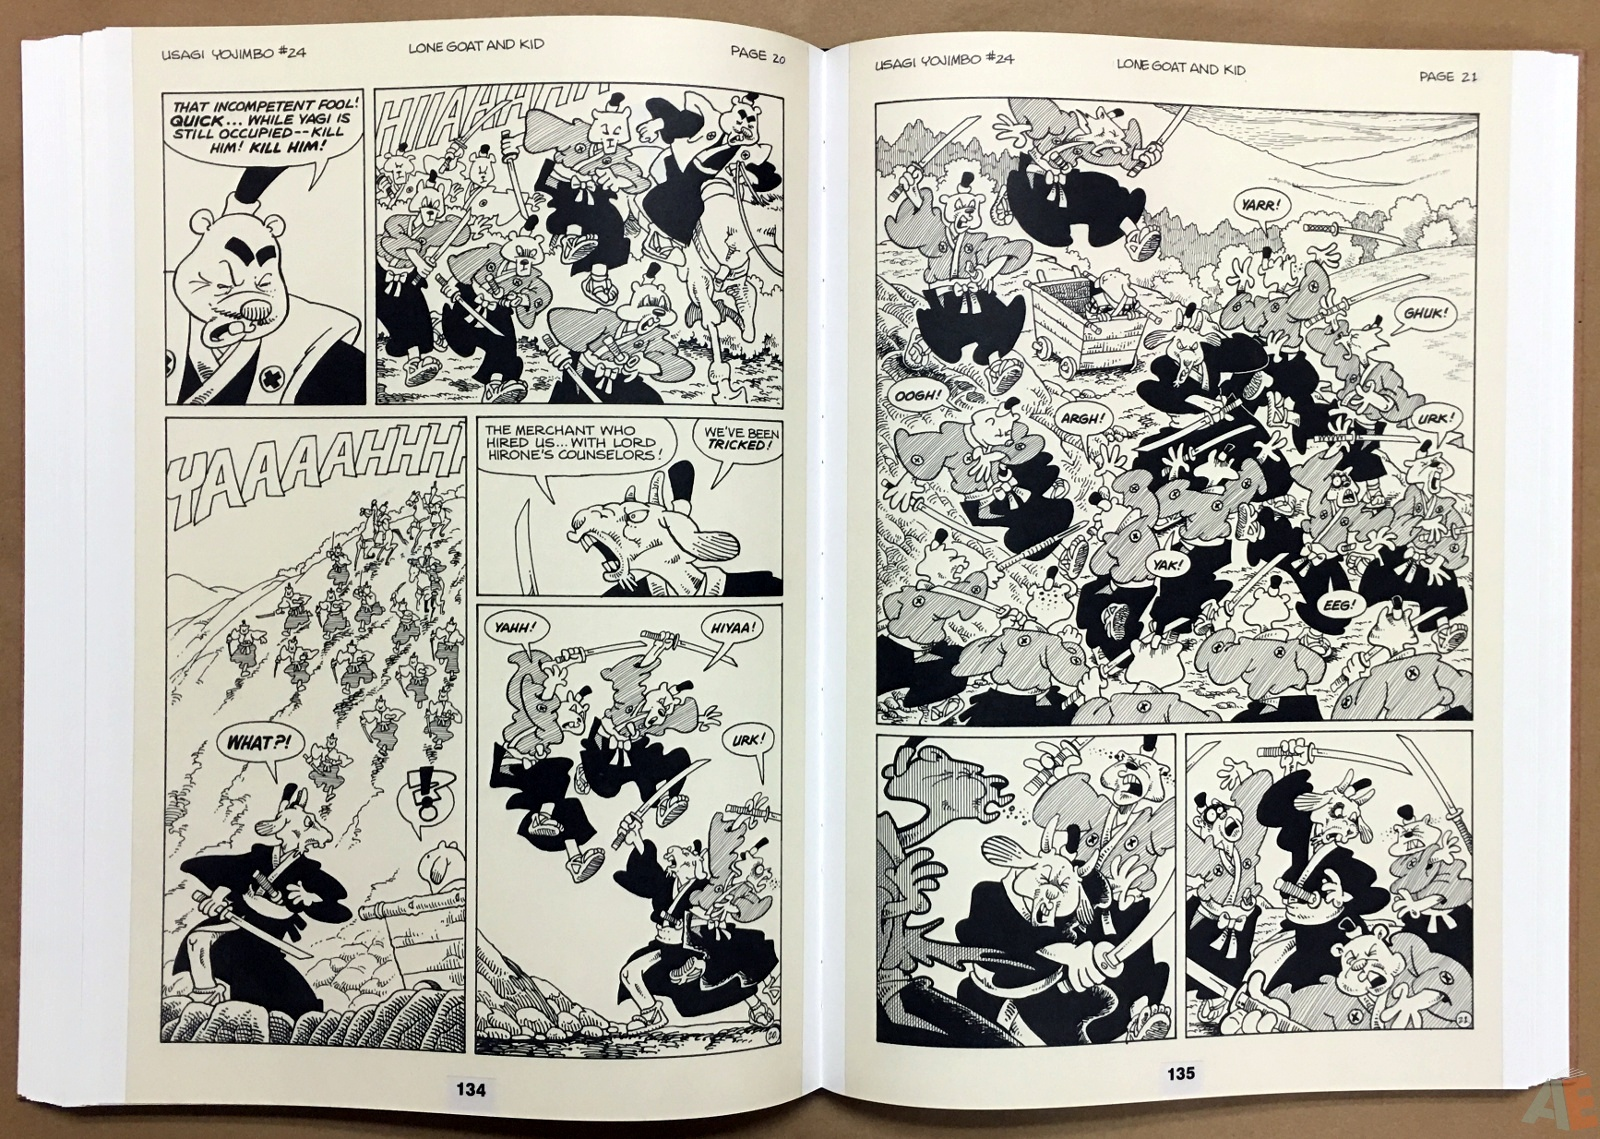 Usagi Yojimbo: Samurai and Other Stories Gallery Edition 28